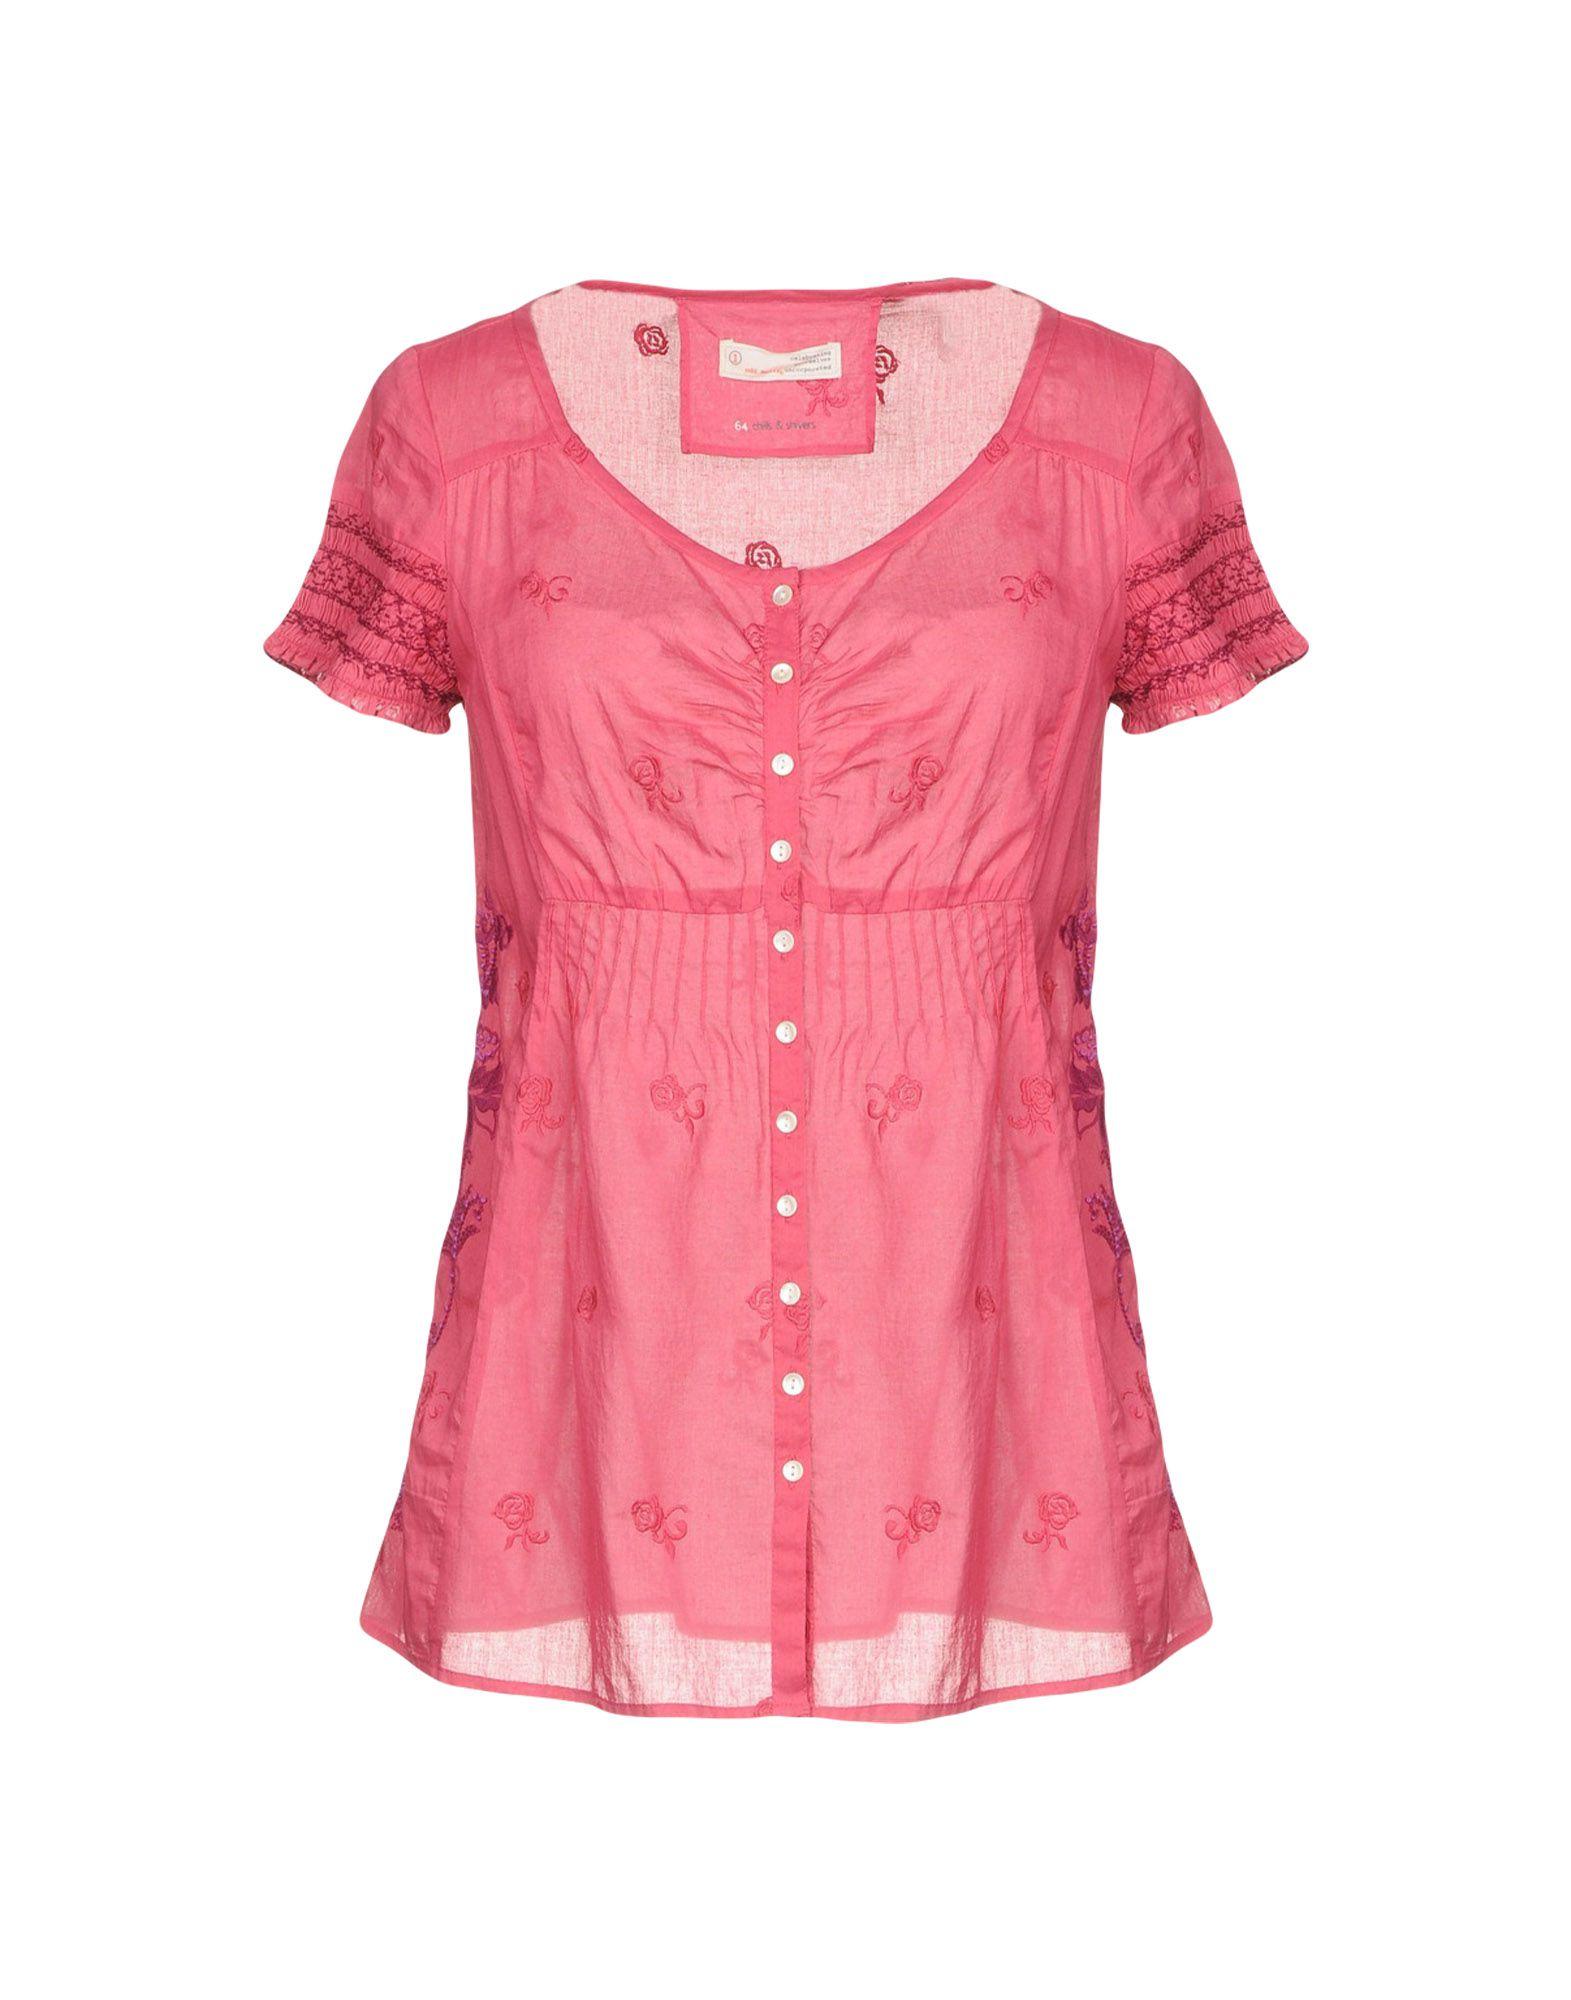 ODD MOLLY Pубашка odd molly платье до колена